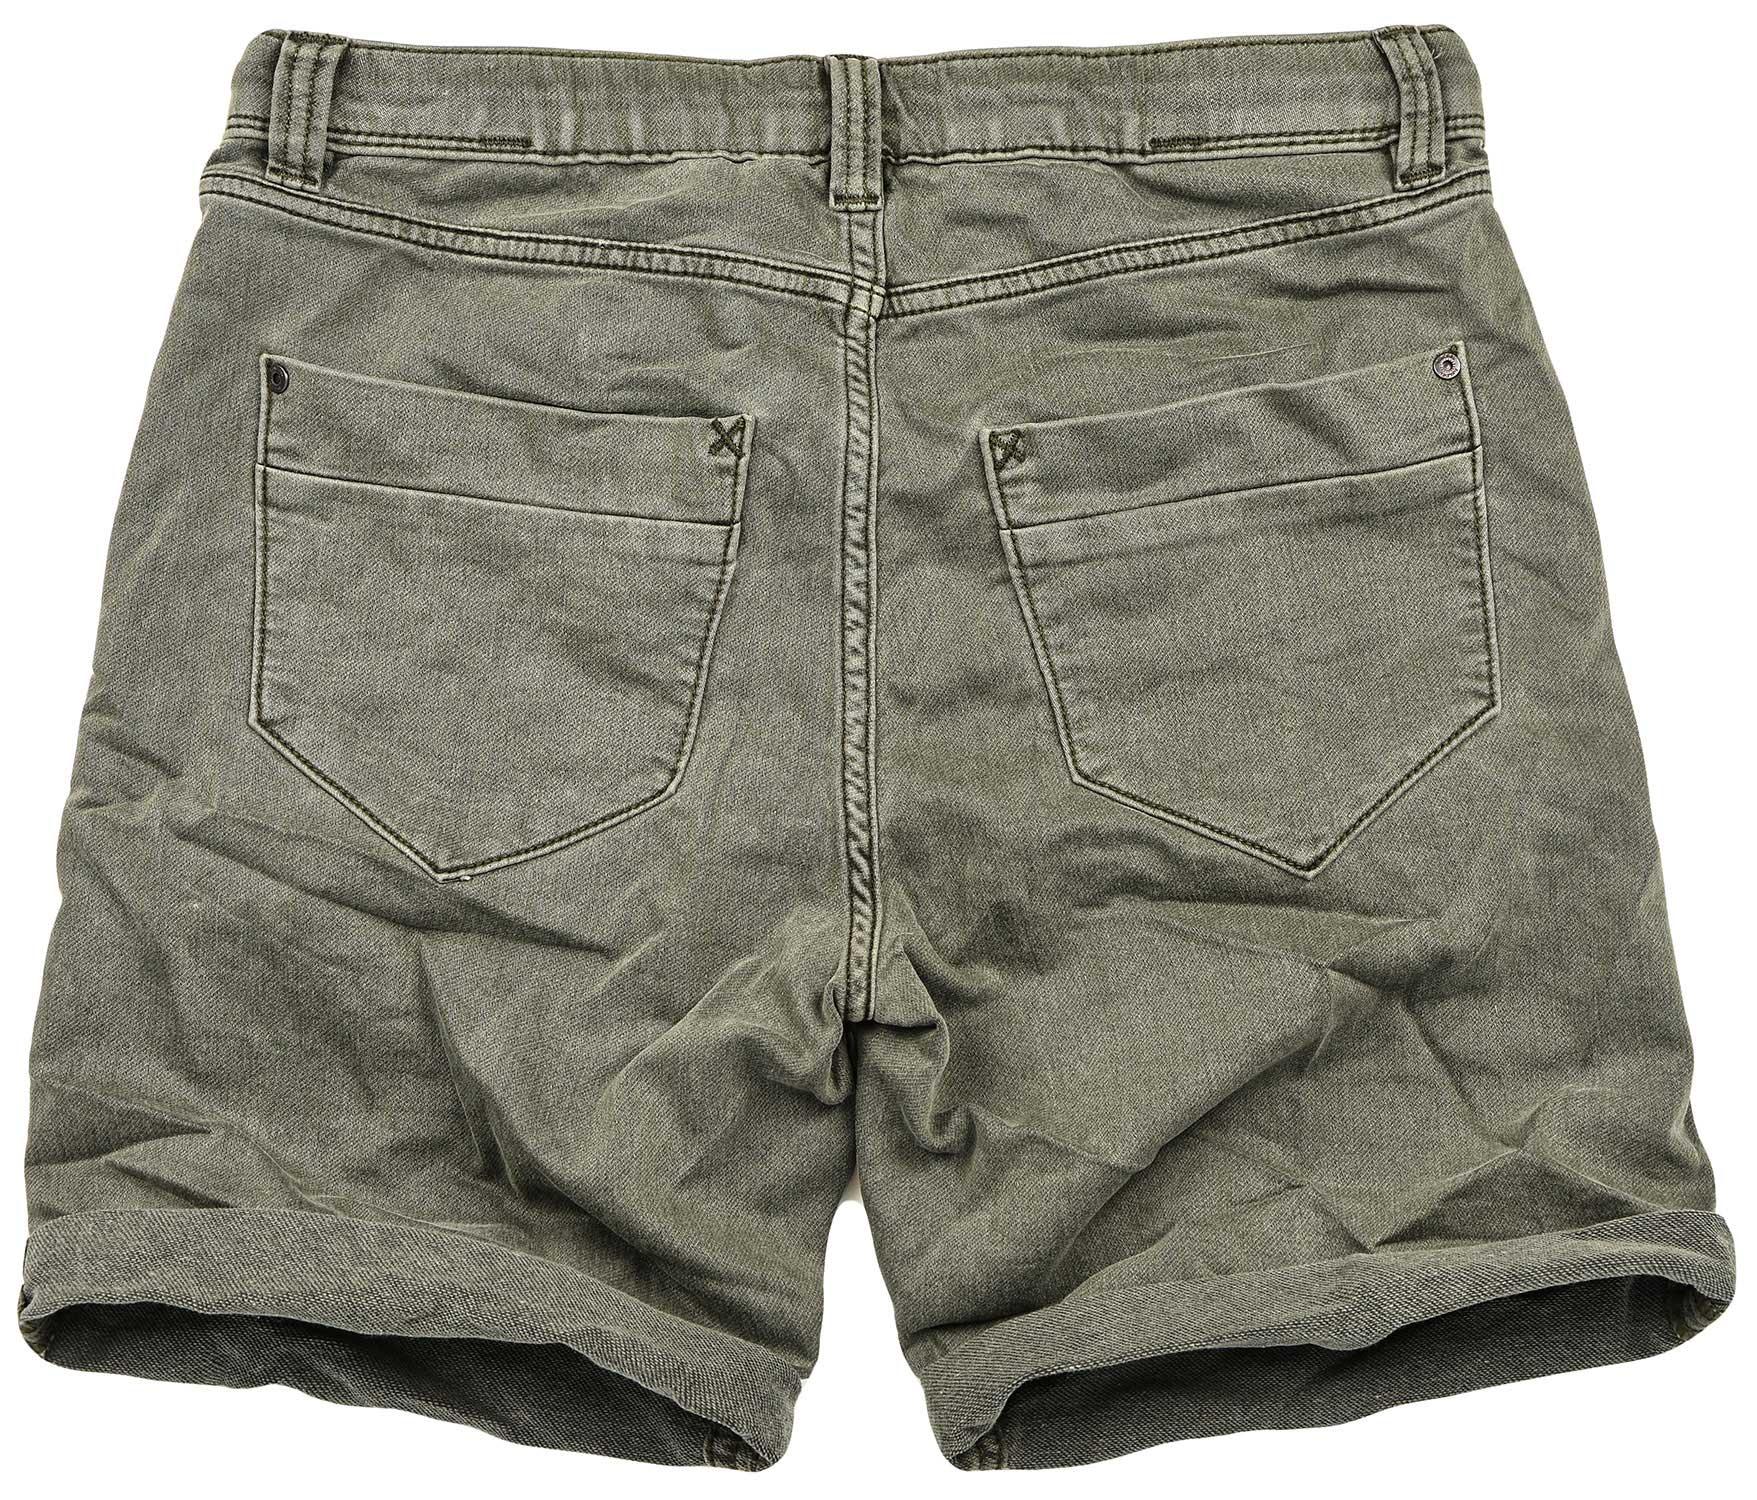 Sublevel-Herren-Sweat-Jeans-Shorts-kurze-Hose-Bermuda-Sommer-Sweathose-Slim-NEU Indexbild 47